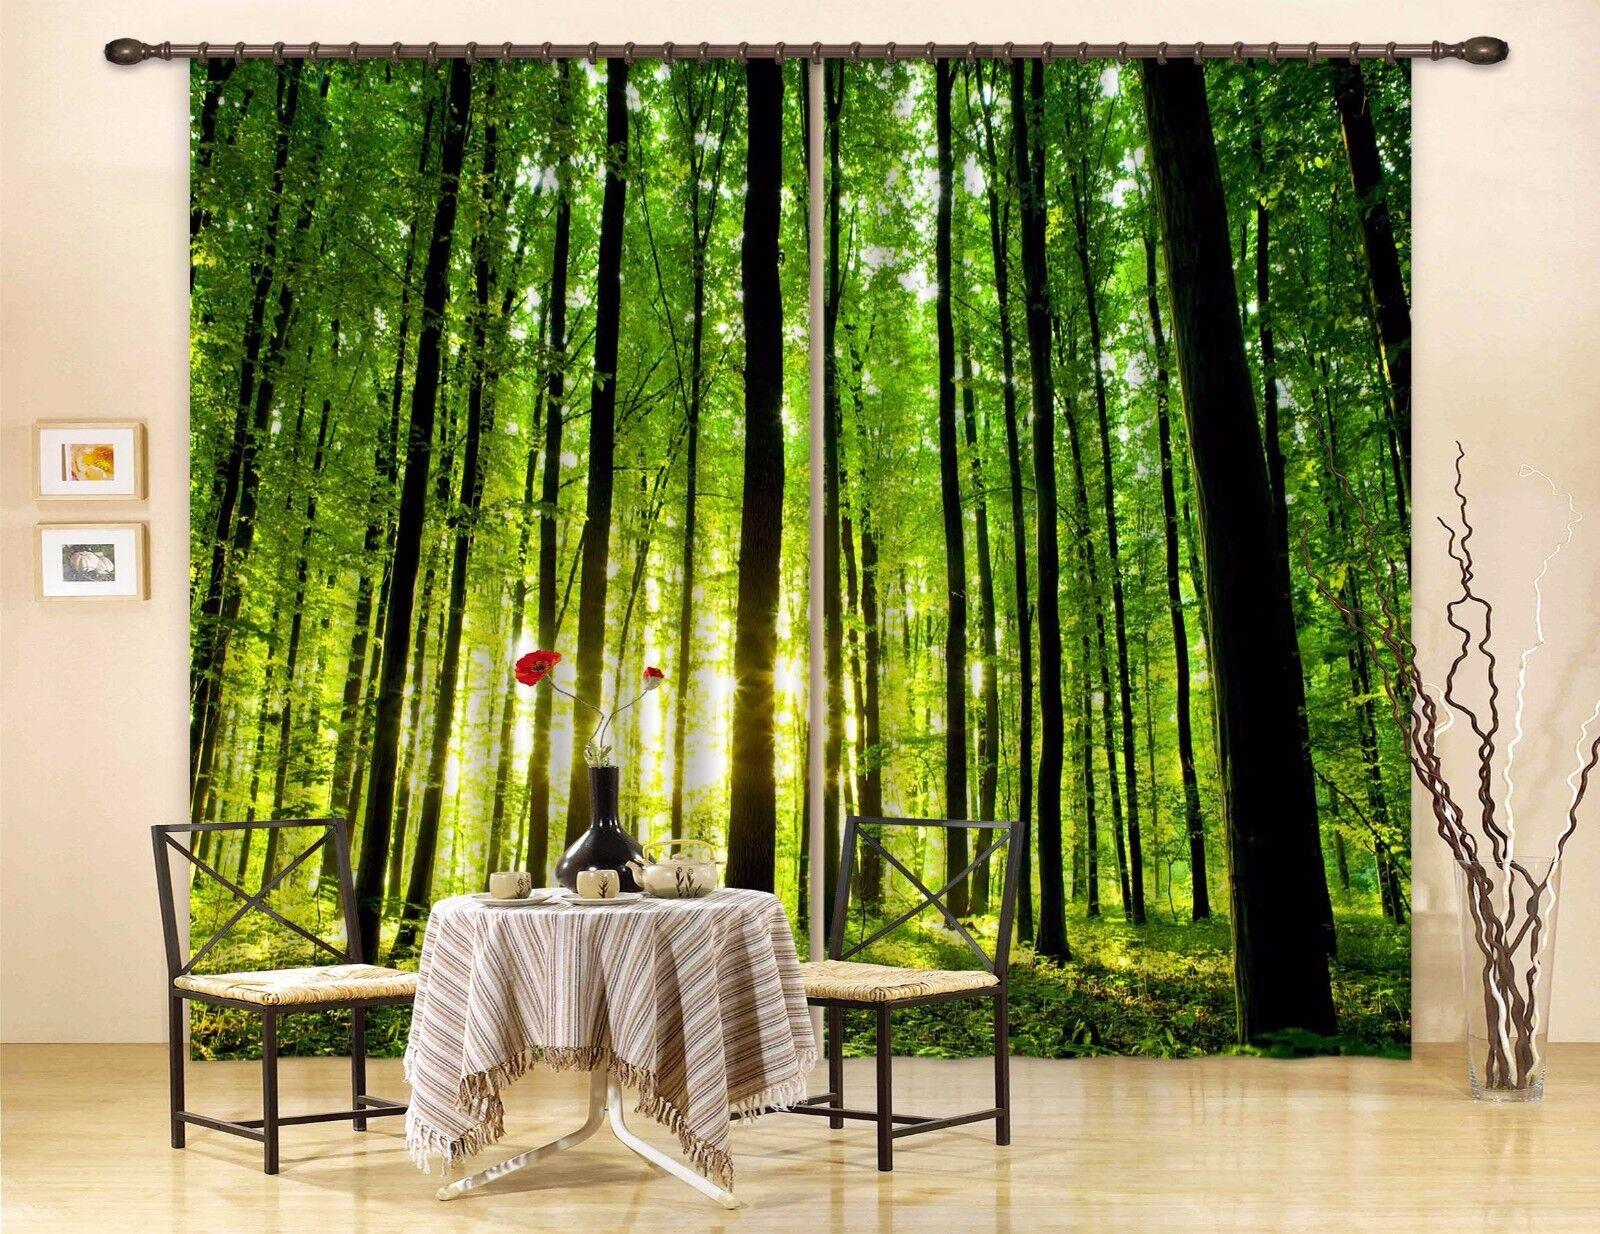 3D Luz de Woods 643 Foto Impresión De Cortina Tela Cortinas Blockout Ventana CA Carly